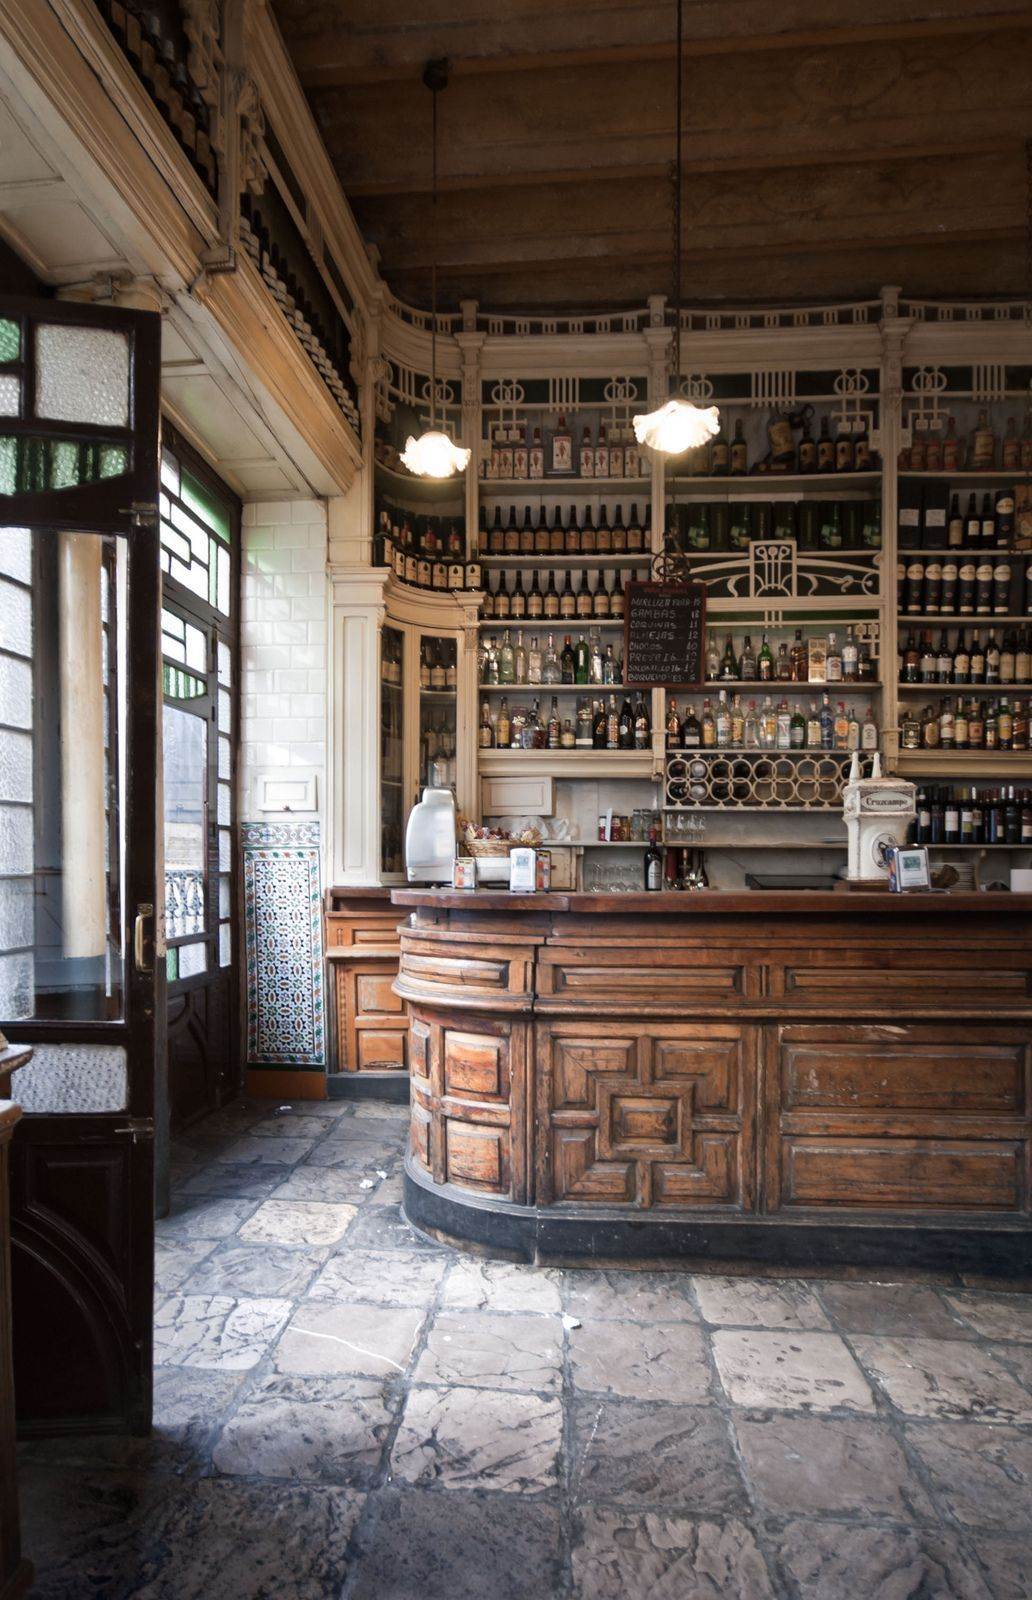 39+ Attractive Restaurant Flooring | Restaurant design, Coffee shop design, Bars for home